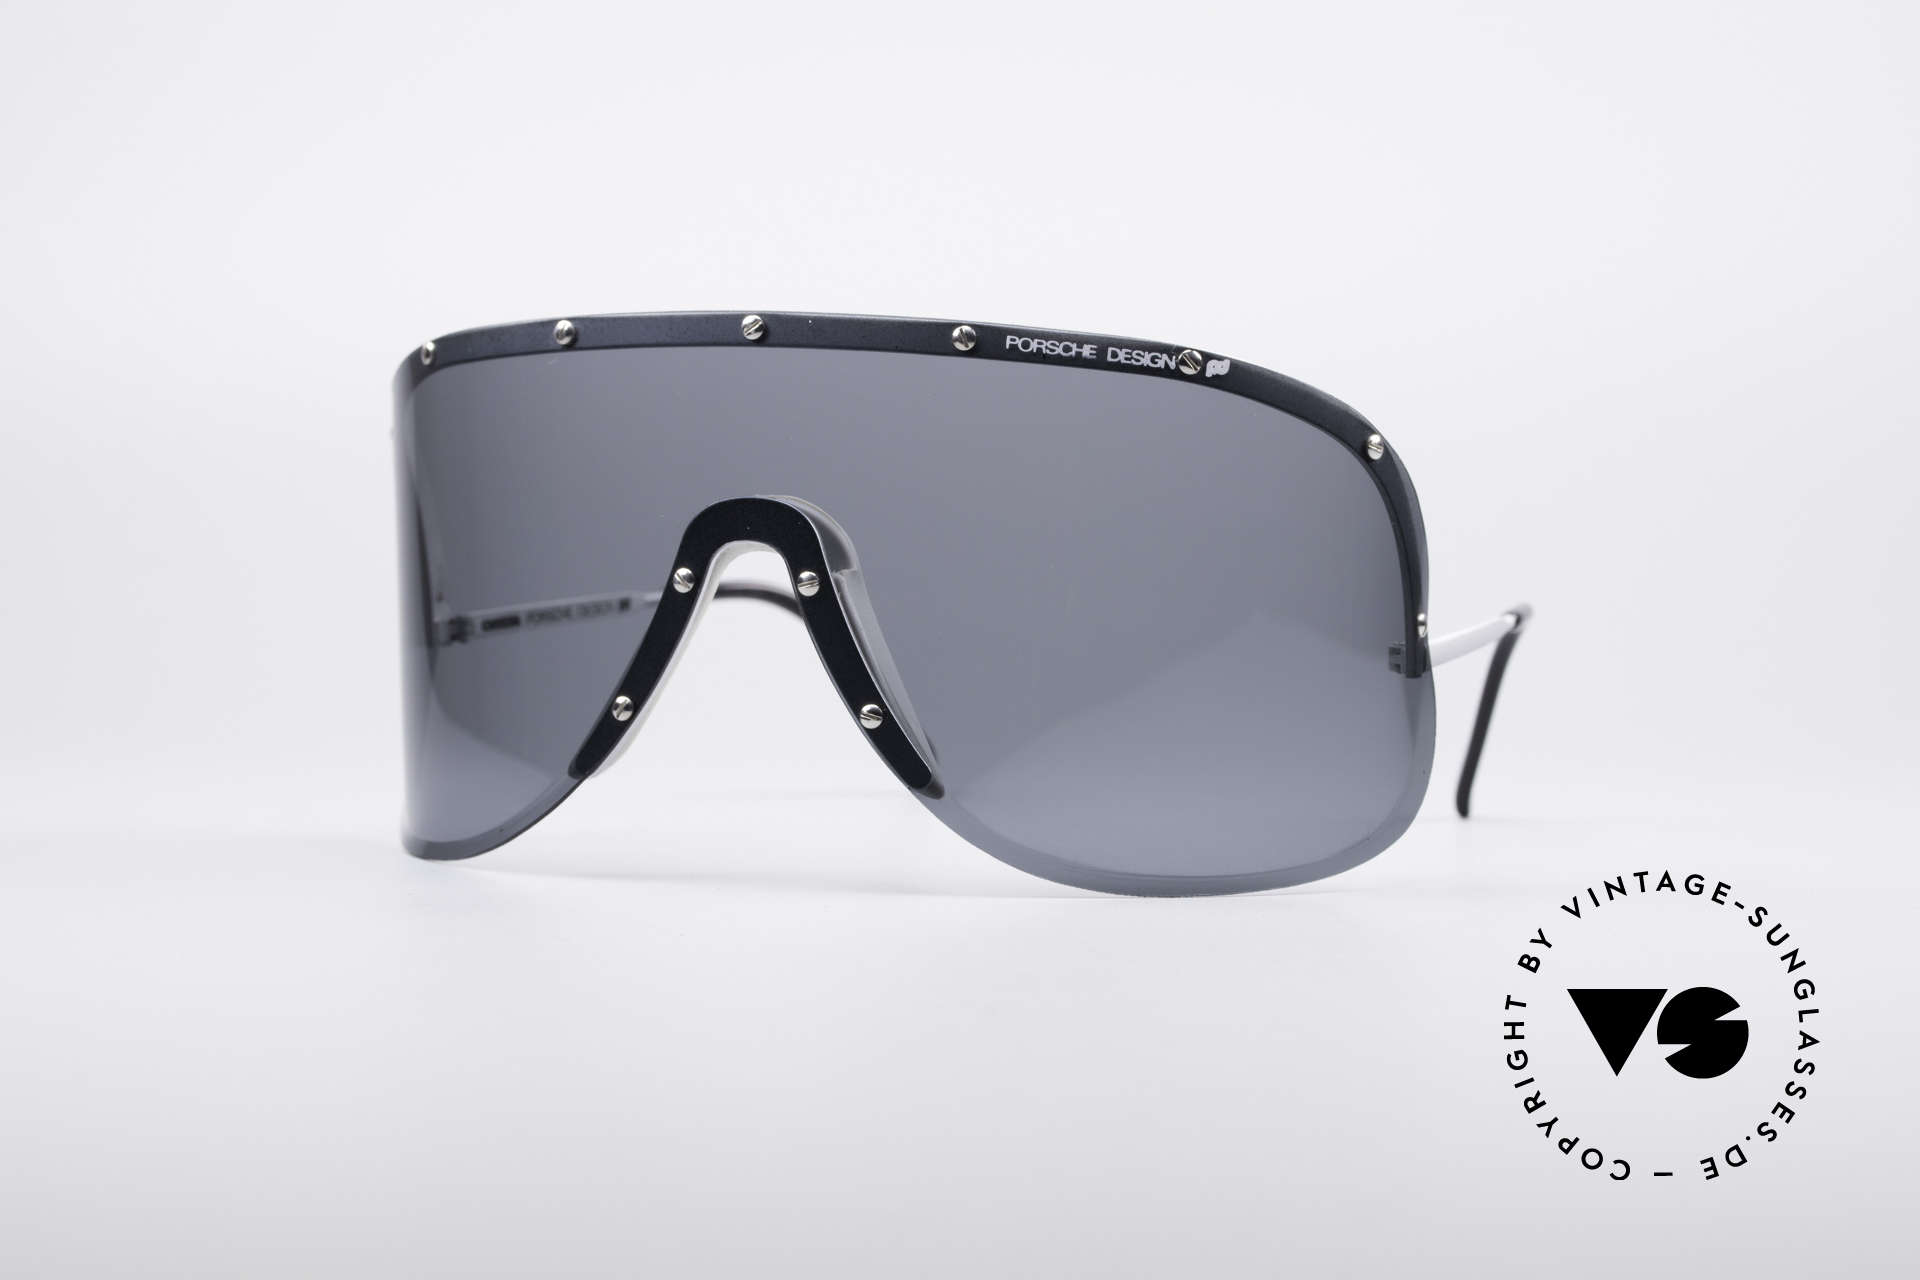 Porsche 5620 Old Yoko Ono Shades Silver, mod. 5620: vintage Porsche sunglasses by Carrera Design, Made for Men and Women